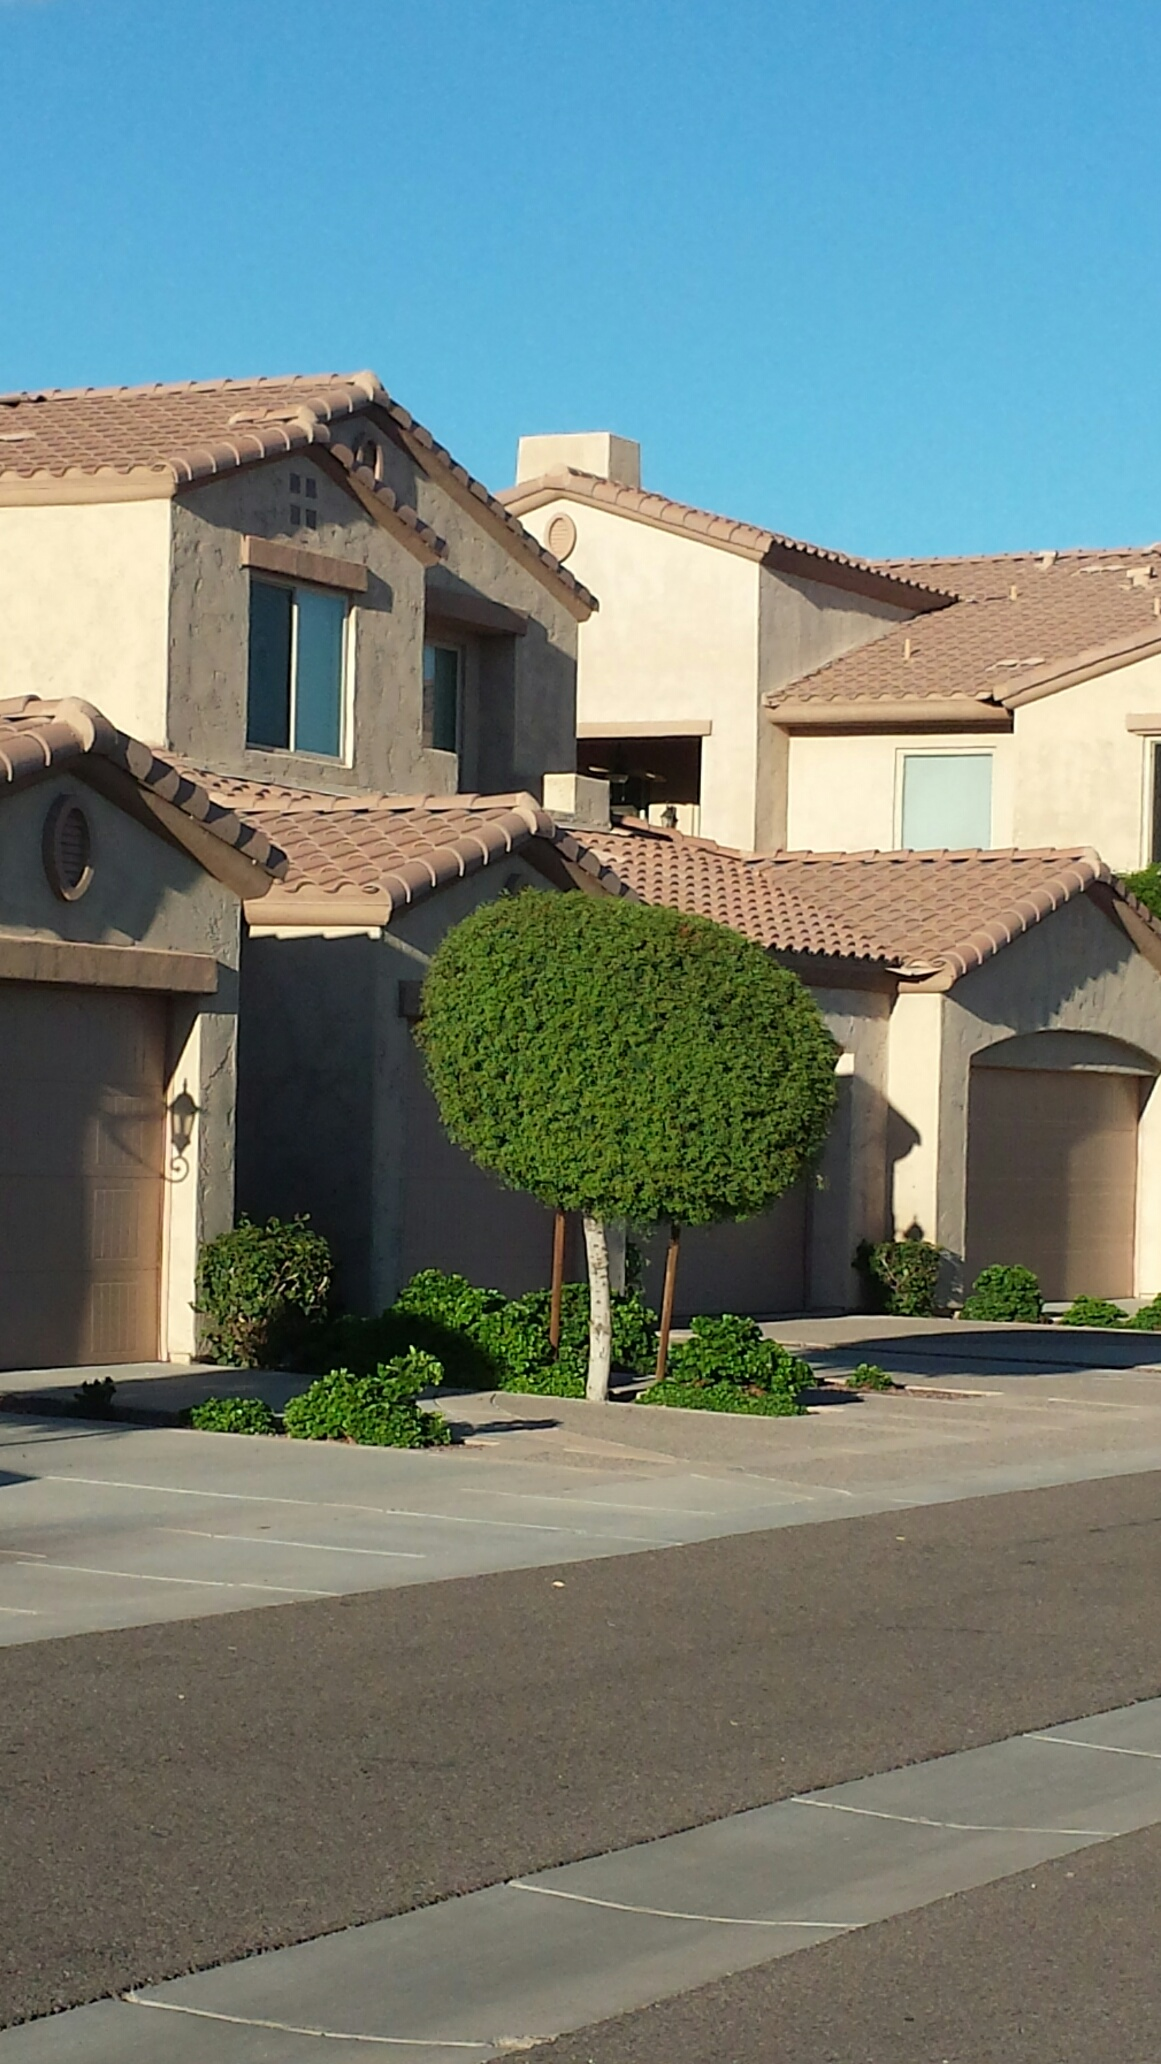 Carino Villas For Sale in Chandler, AZ